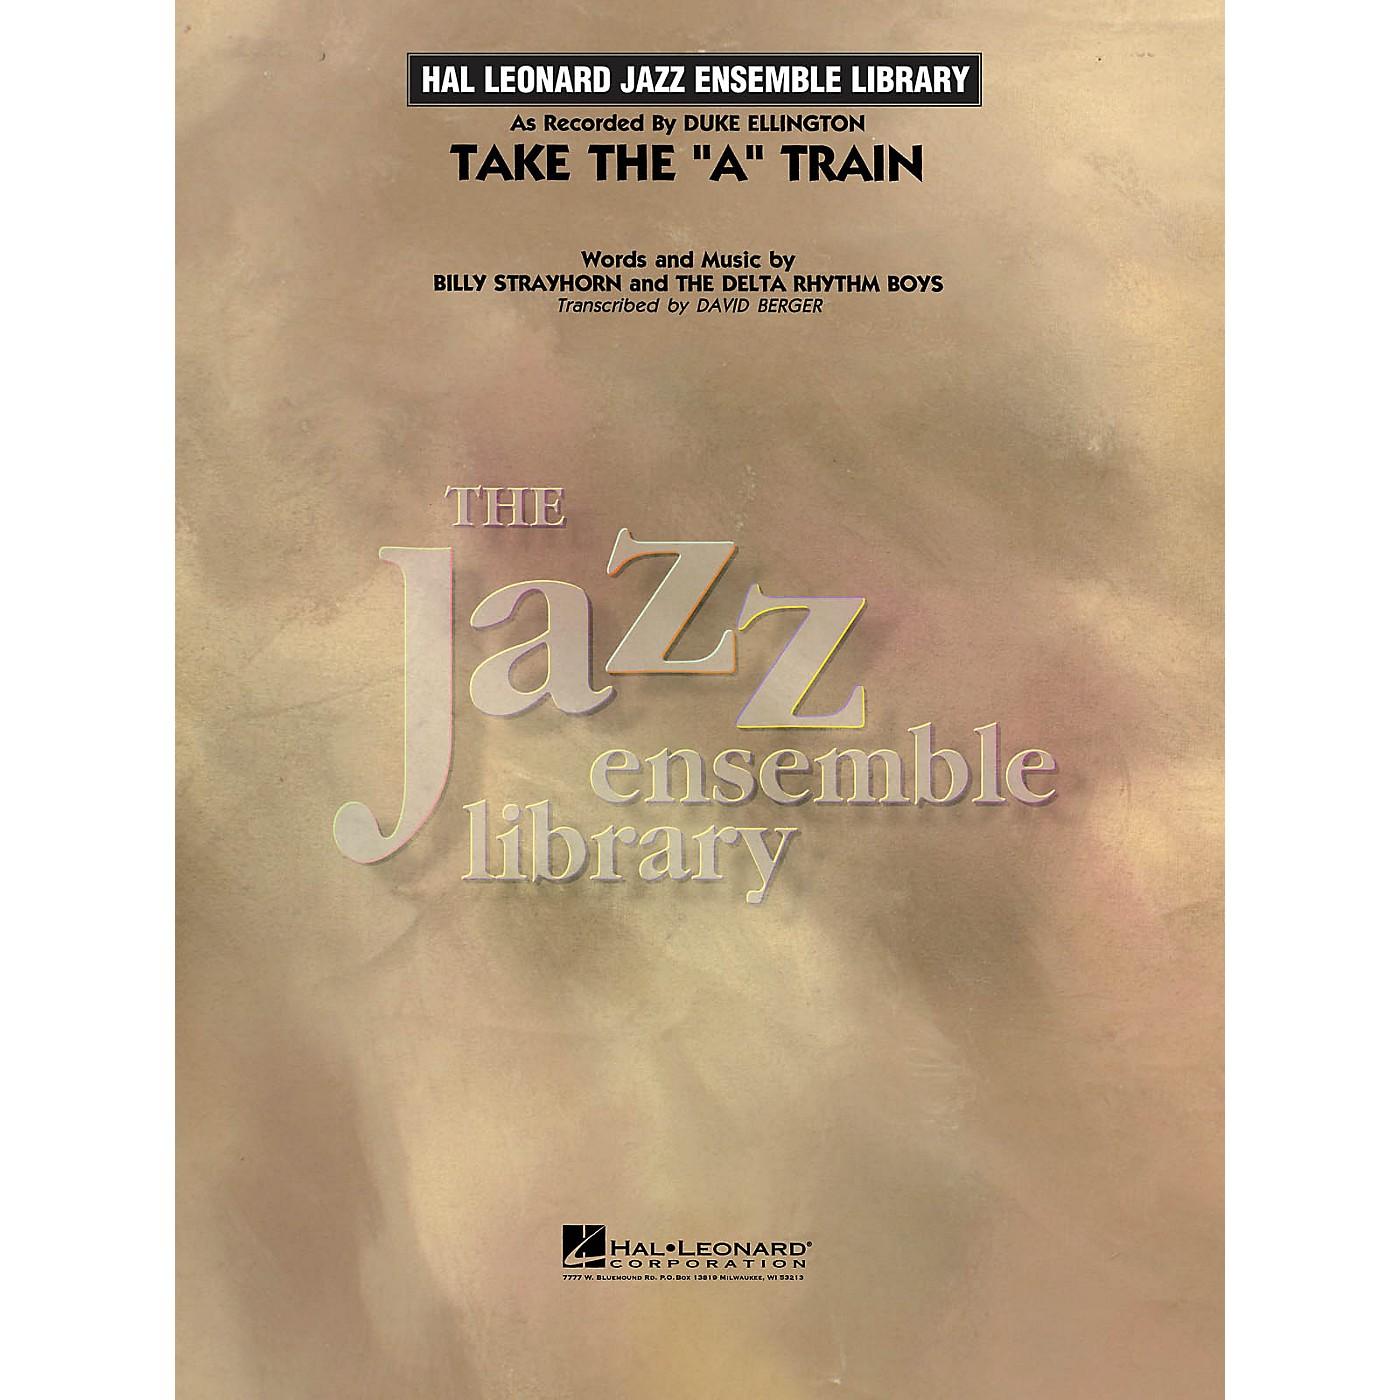 Hal Leonard Take the 'A' Train (transcription) Jazz Band Level 4 by Duke Ellington Arranged by David Berger thumbnail